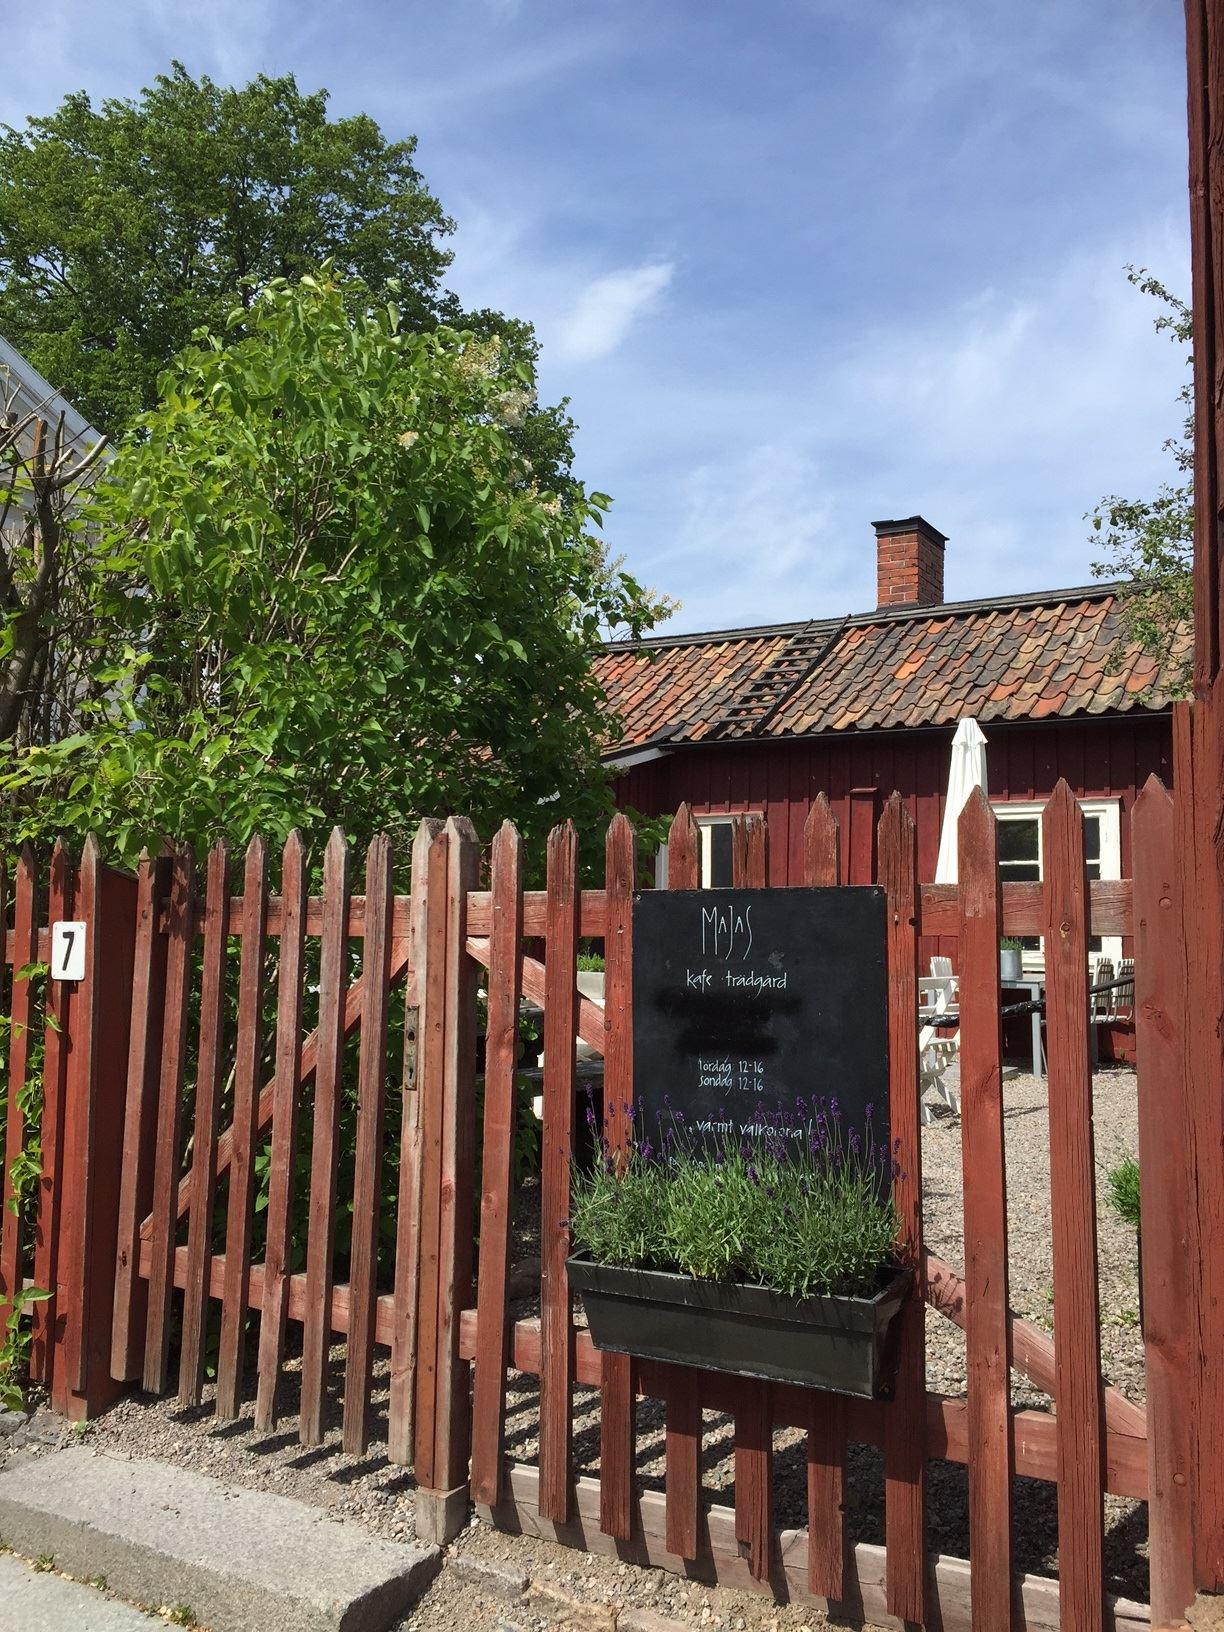 Majas Kaffestuga (Snus-Majas café)